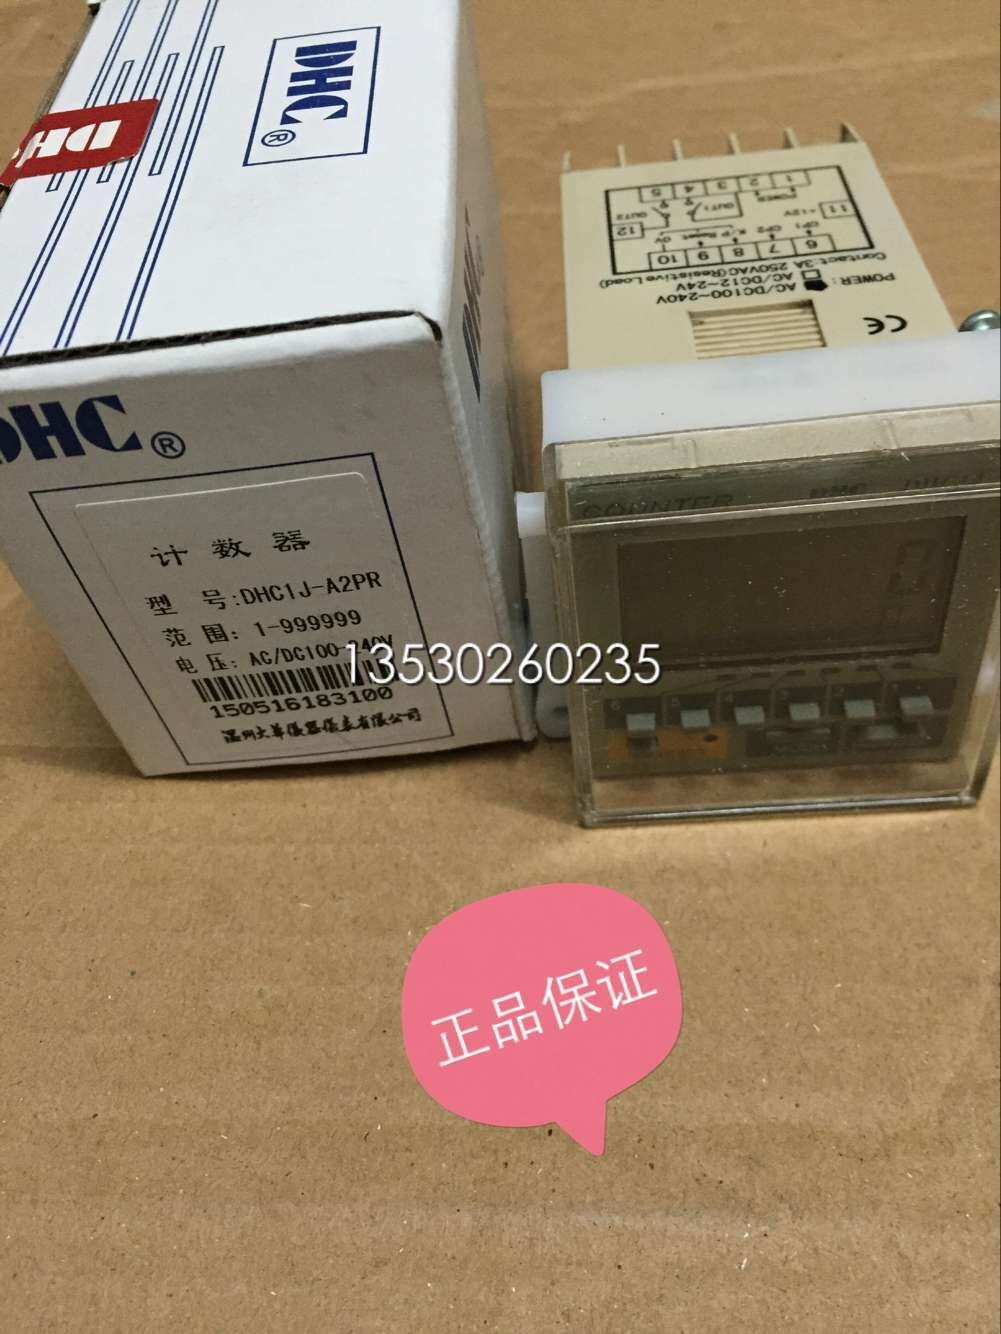 DHC1J-A2PR DHC1J-ATR DHC1J-ABR Photoelectric Switch original instrument system class counter dhc1j a1r